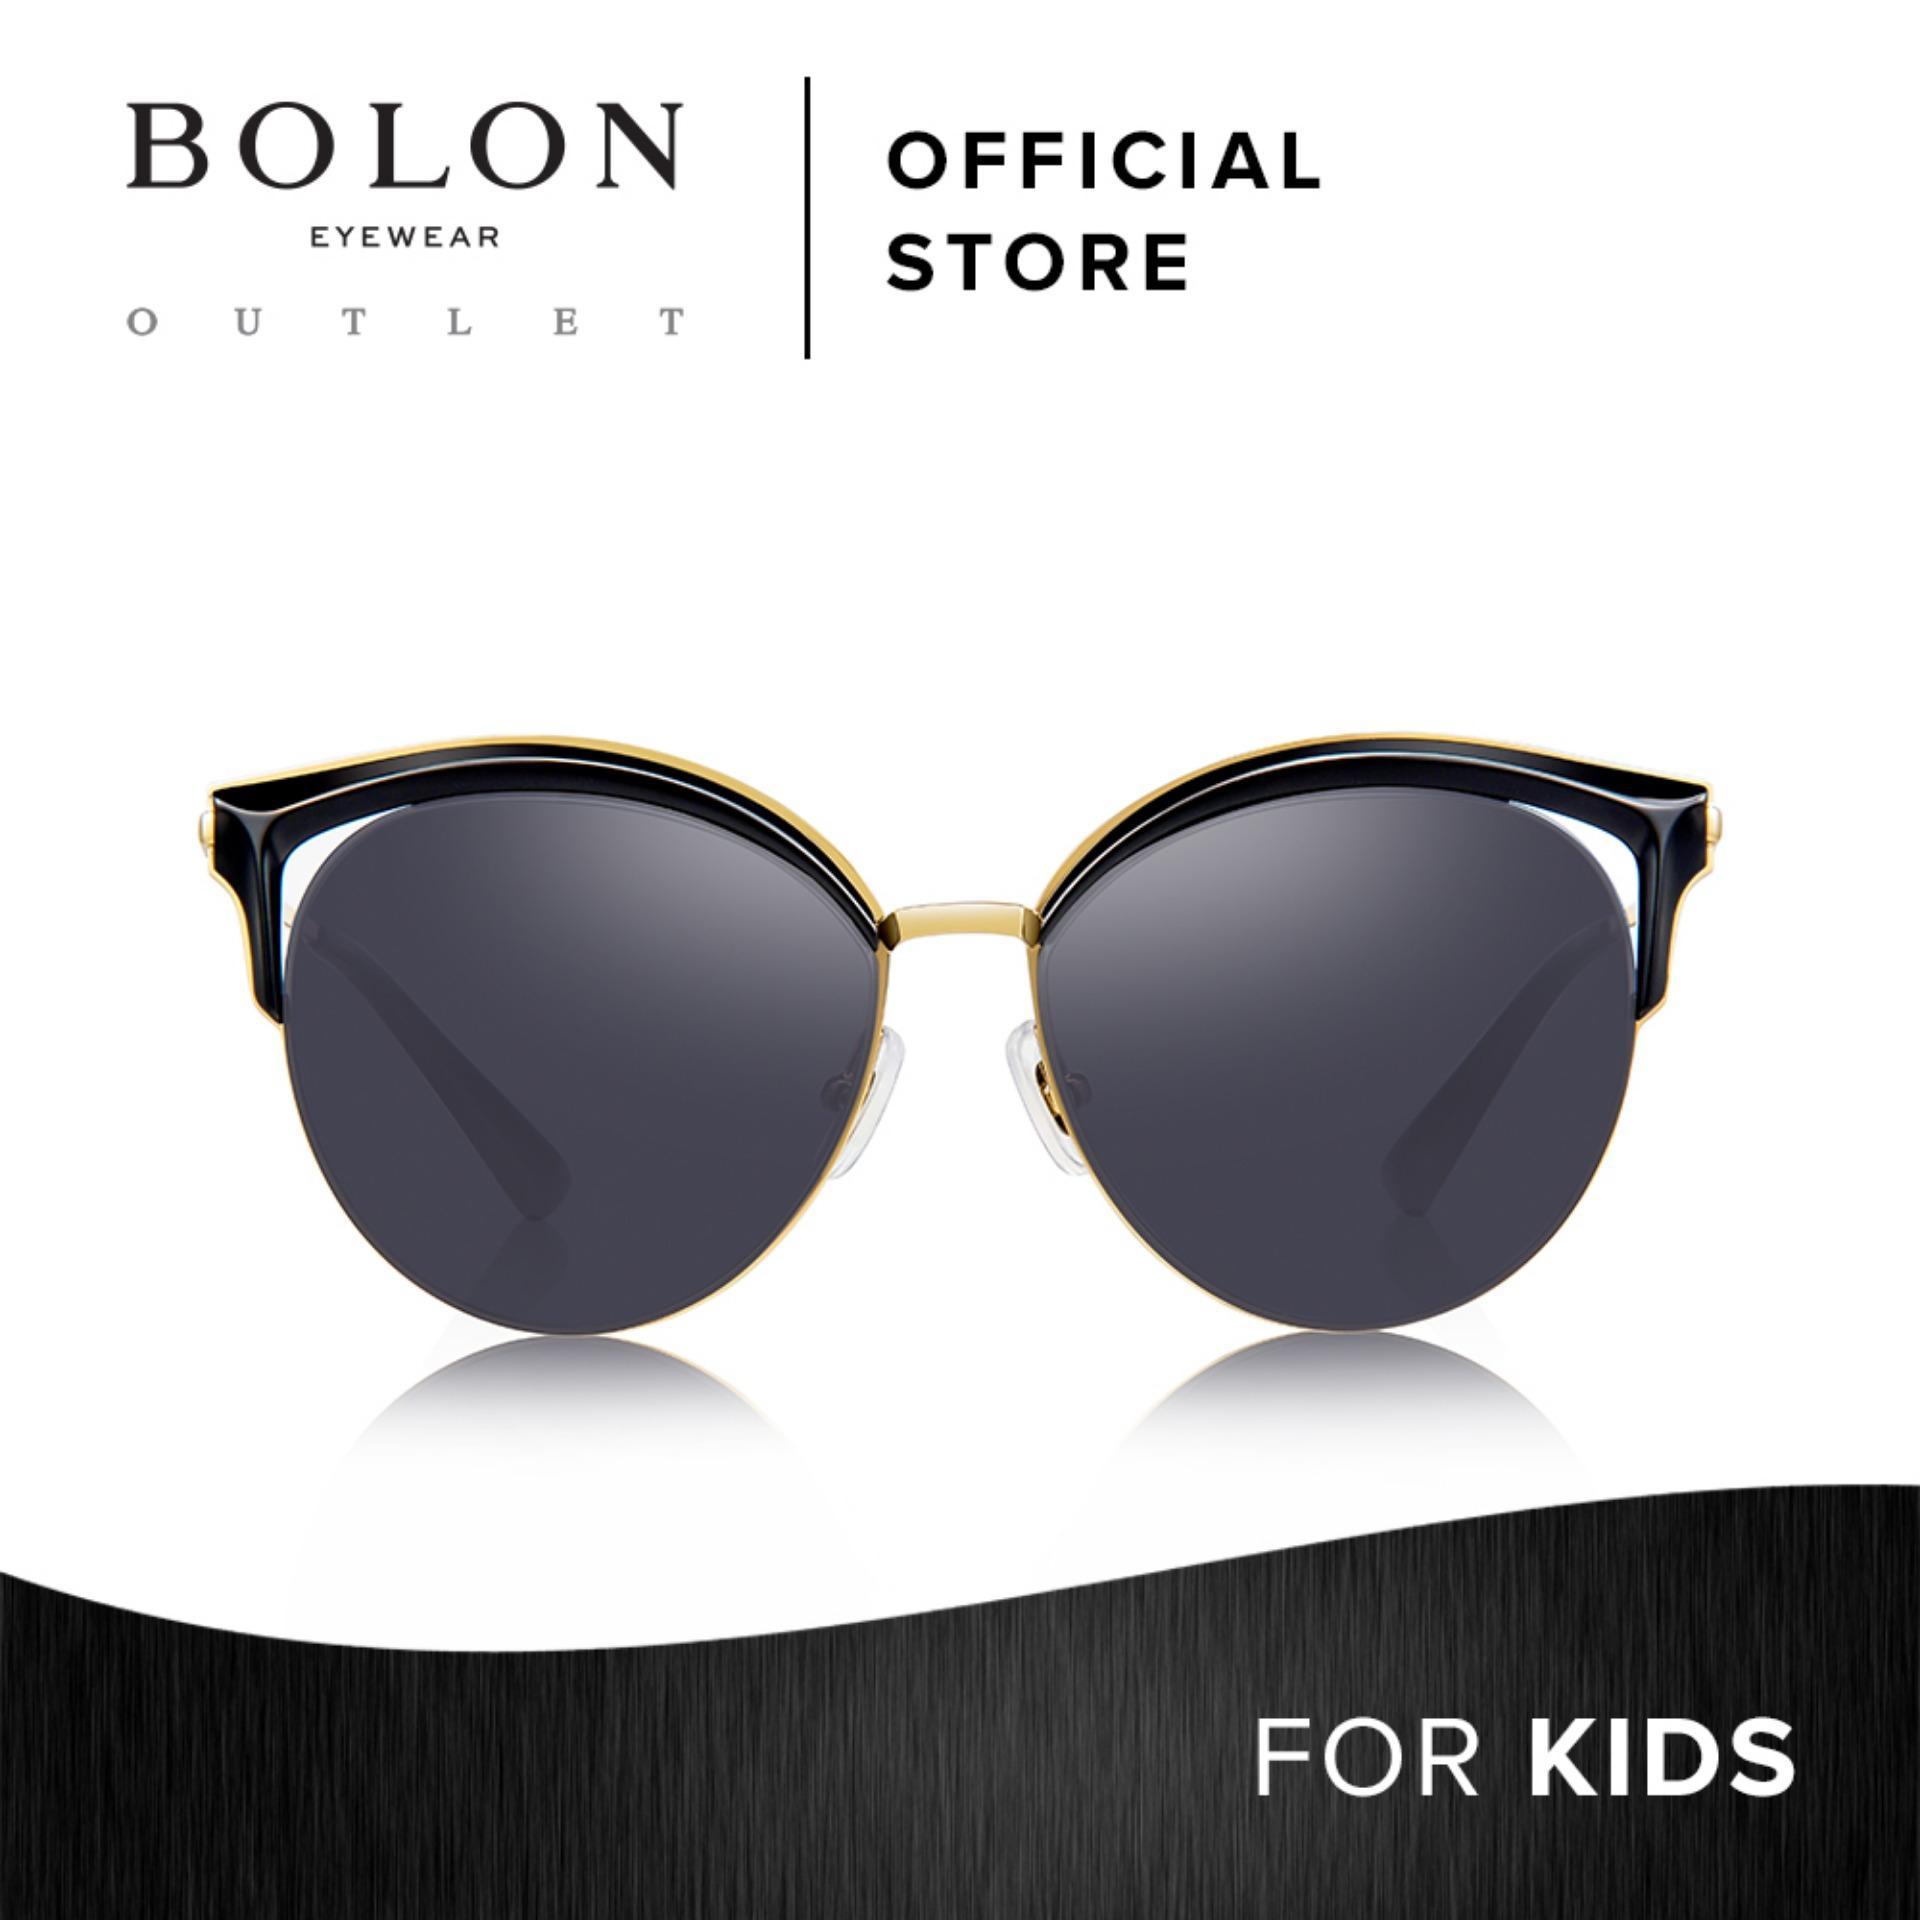 4163acfd3aa BOLON Eyewear Kids Cat Eye Sunglasses Petit Anne BK6006 Black Gold